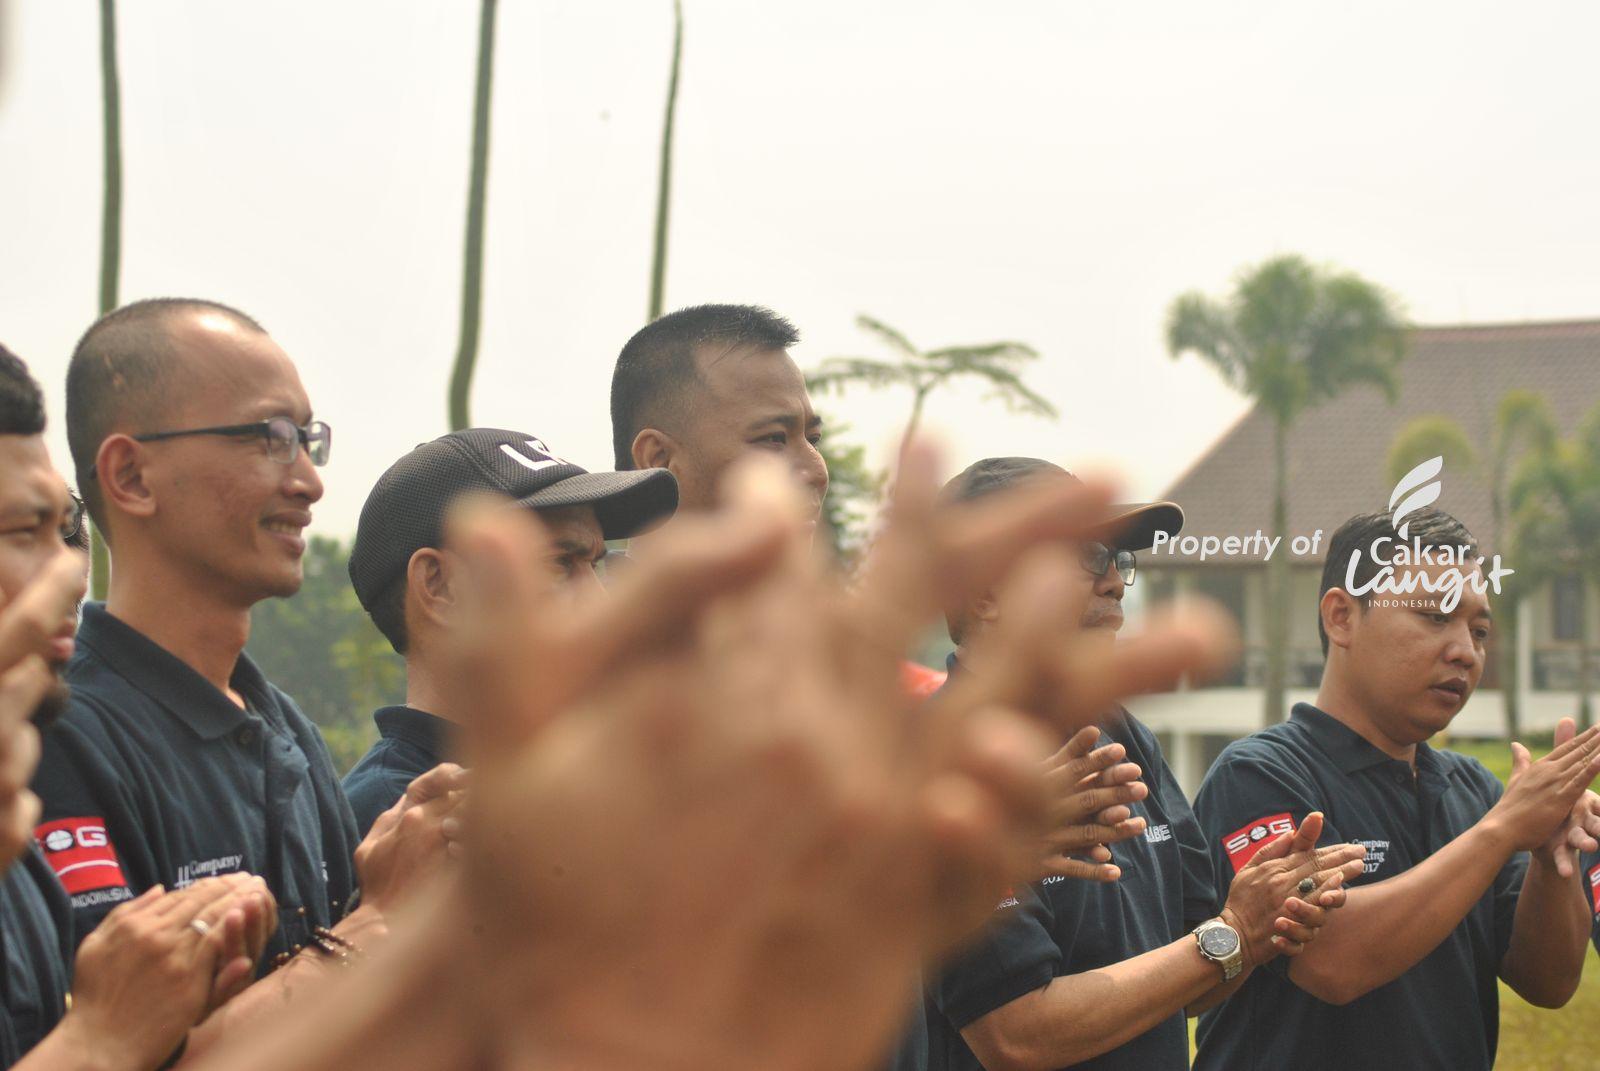 Harga Paket Outbound Training Jimmers Mountain Resort Bogor